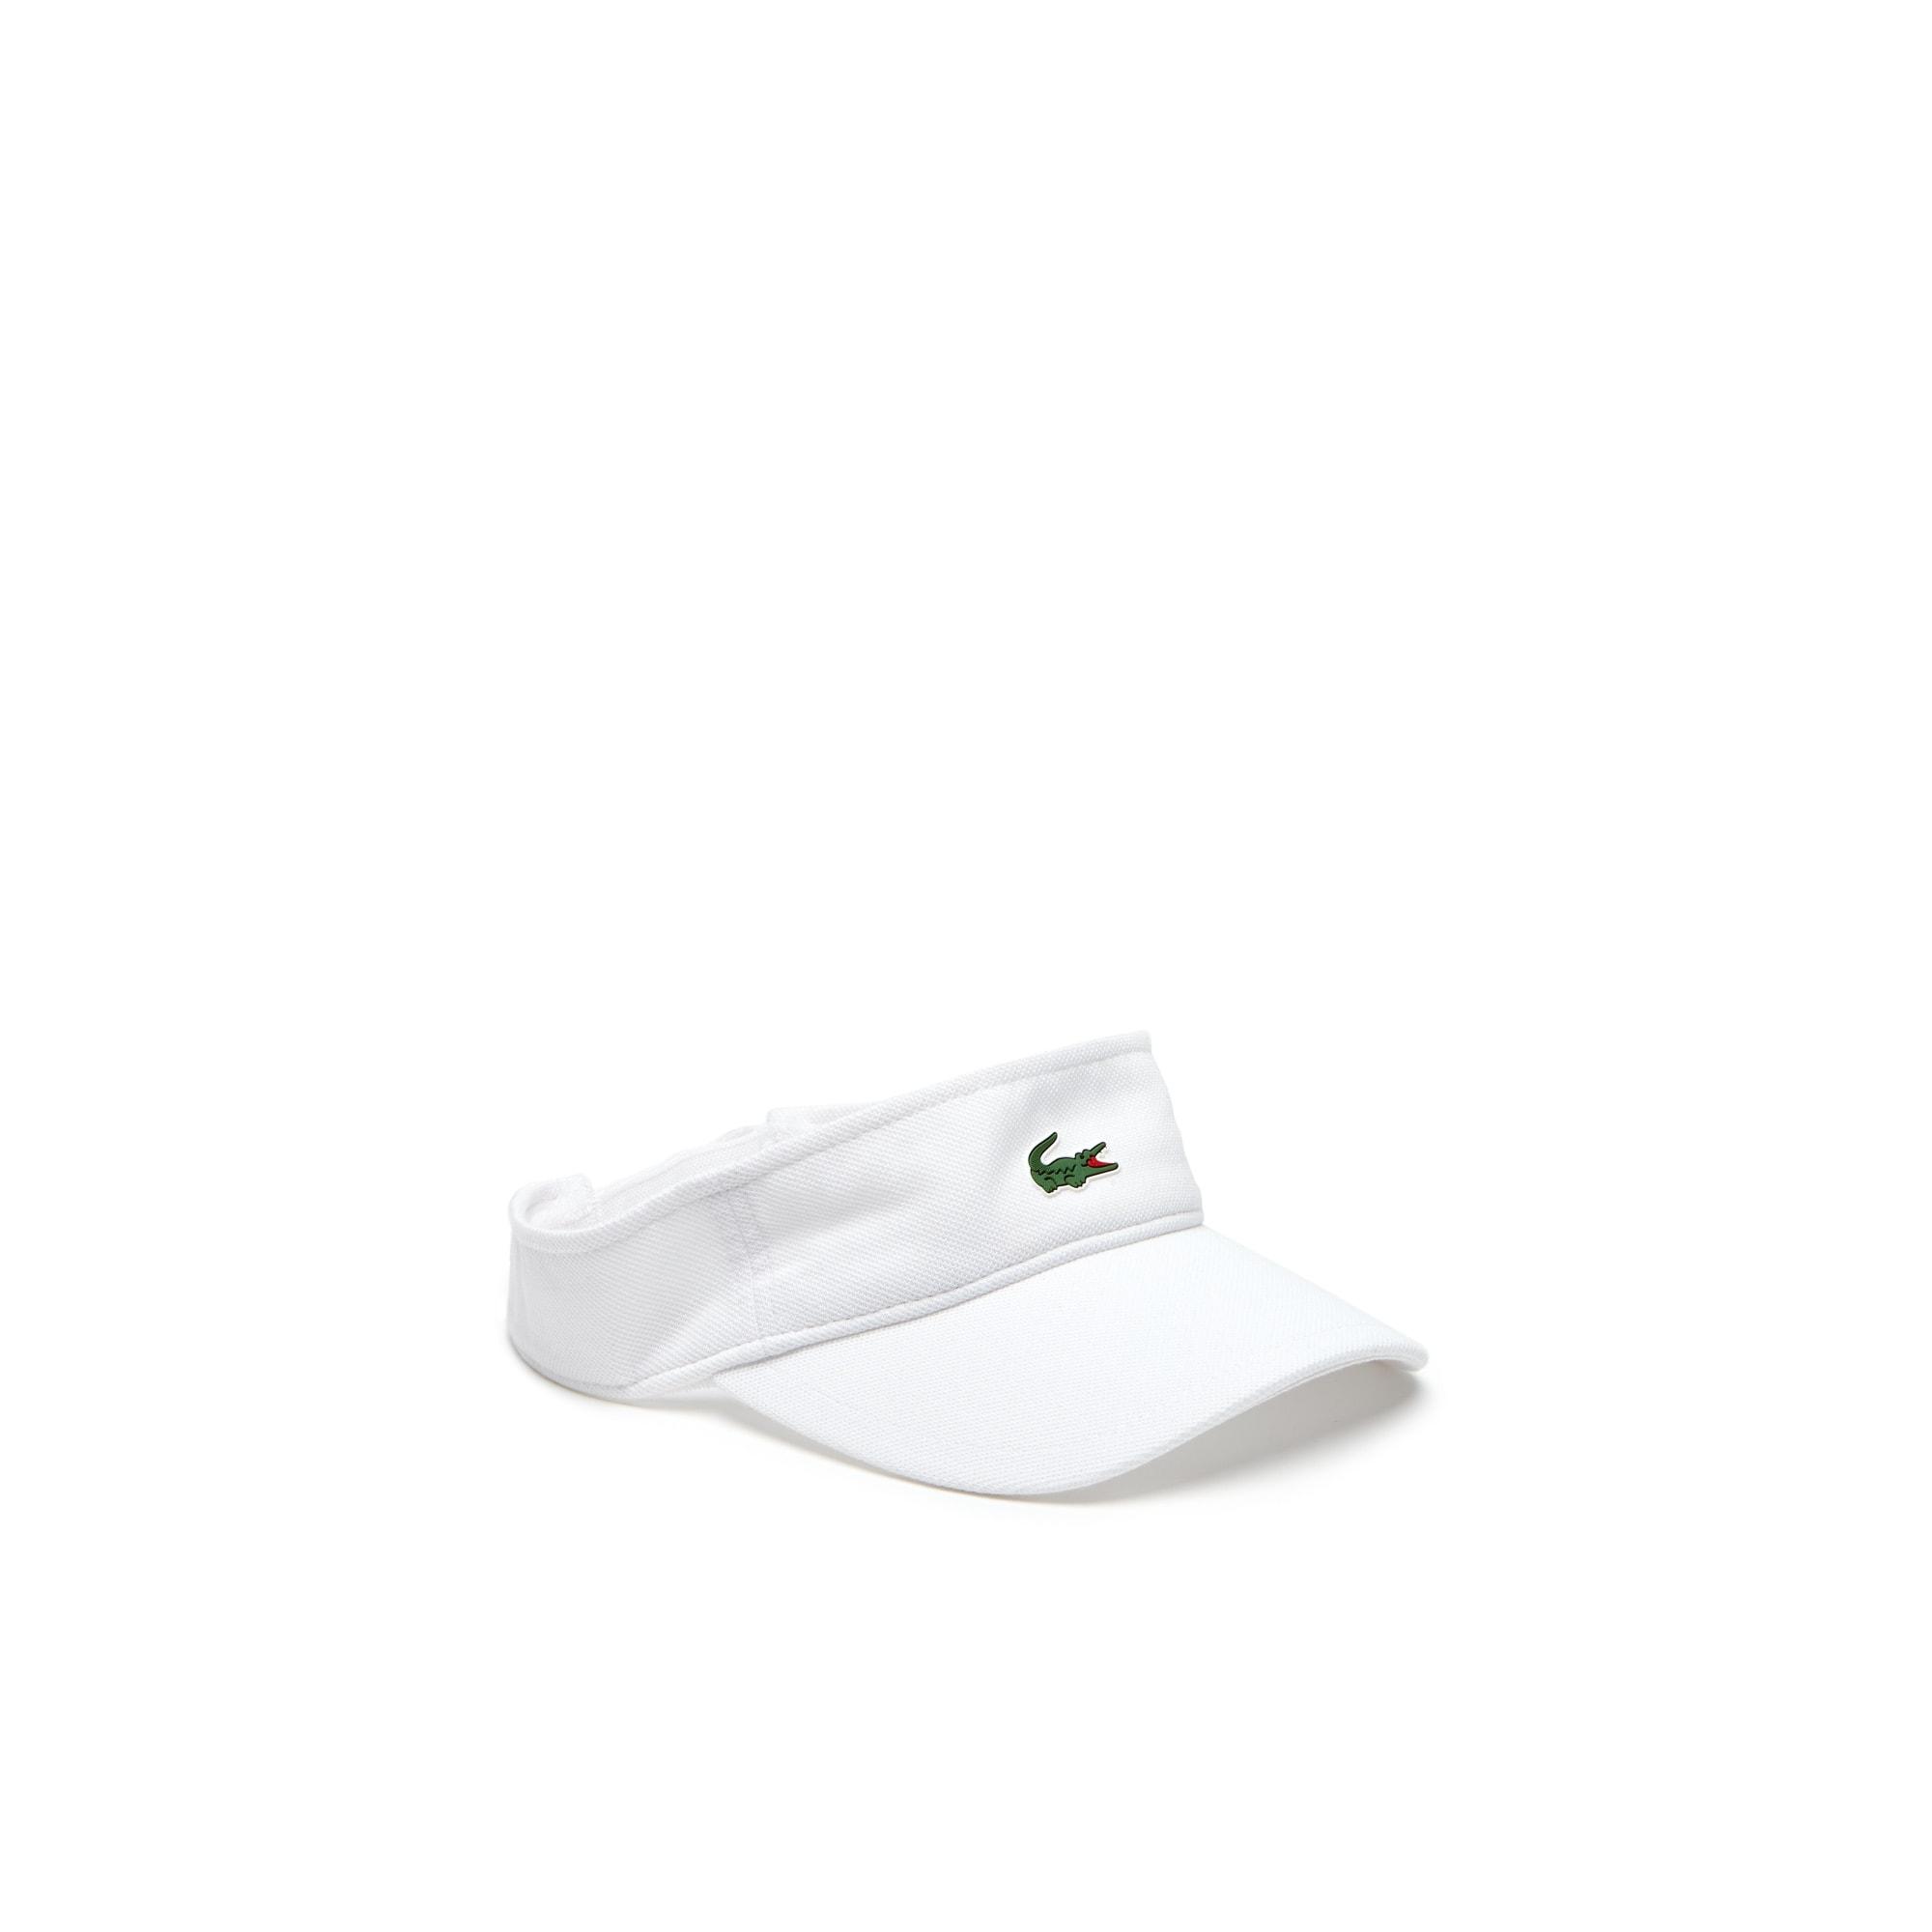 Herren LACOSTE SPORT Tennis-Schirmkappe aus Piqué und Fleece